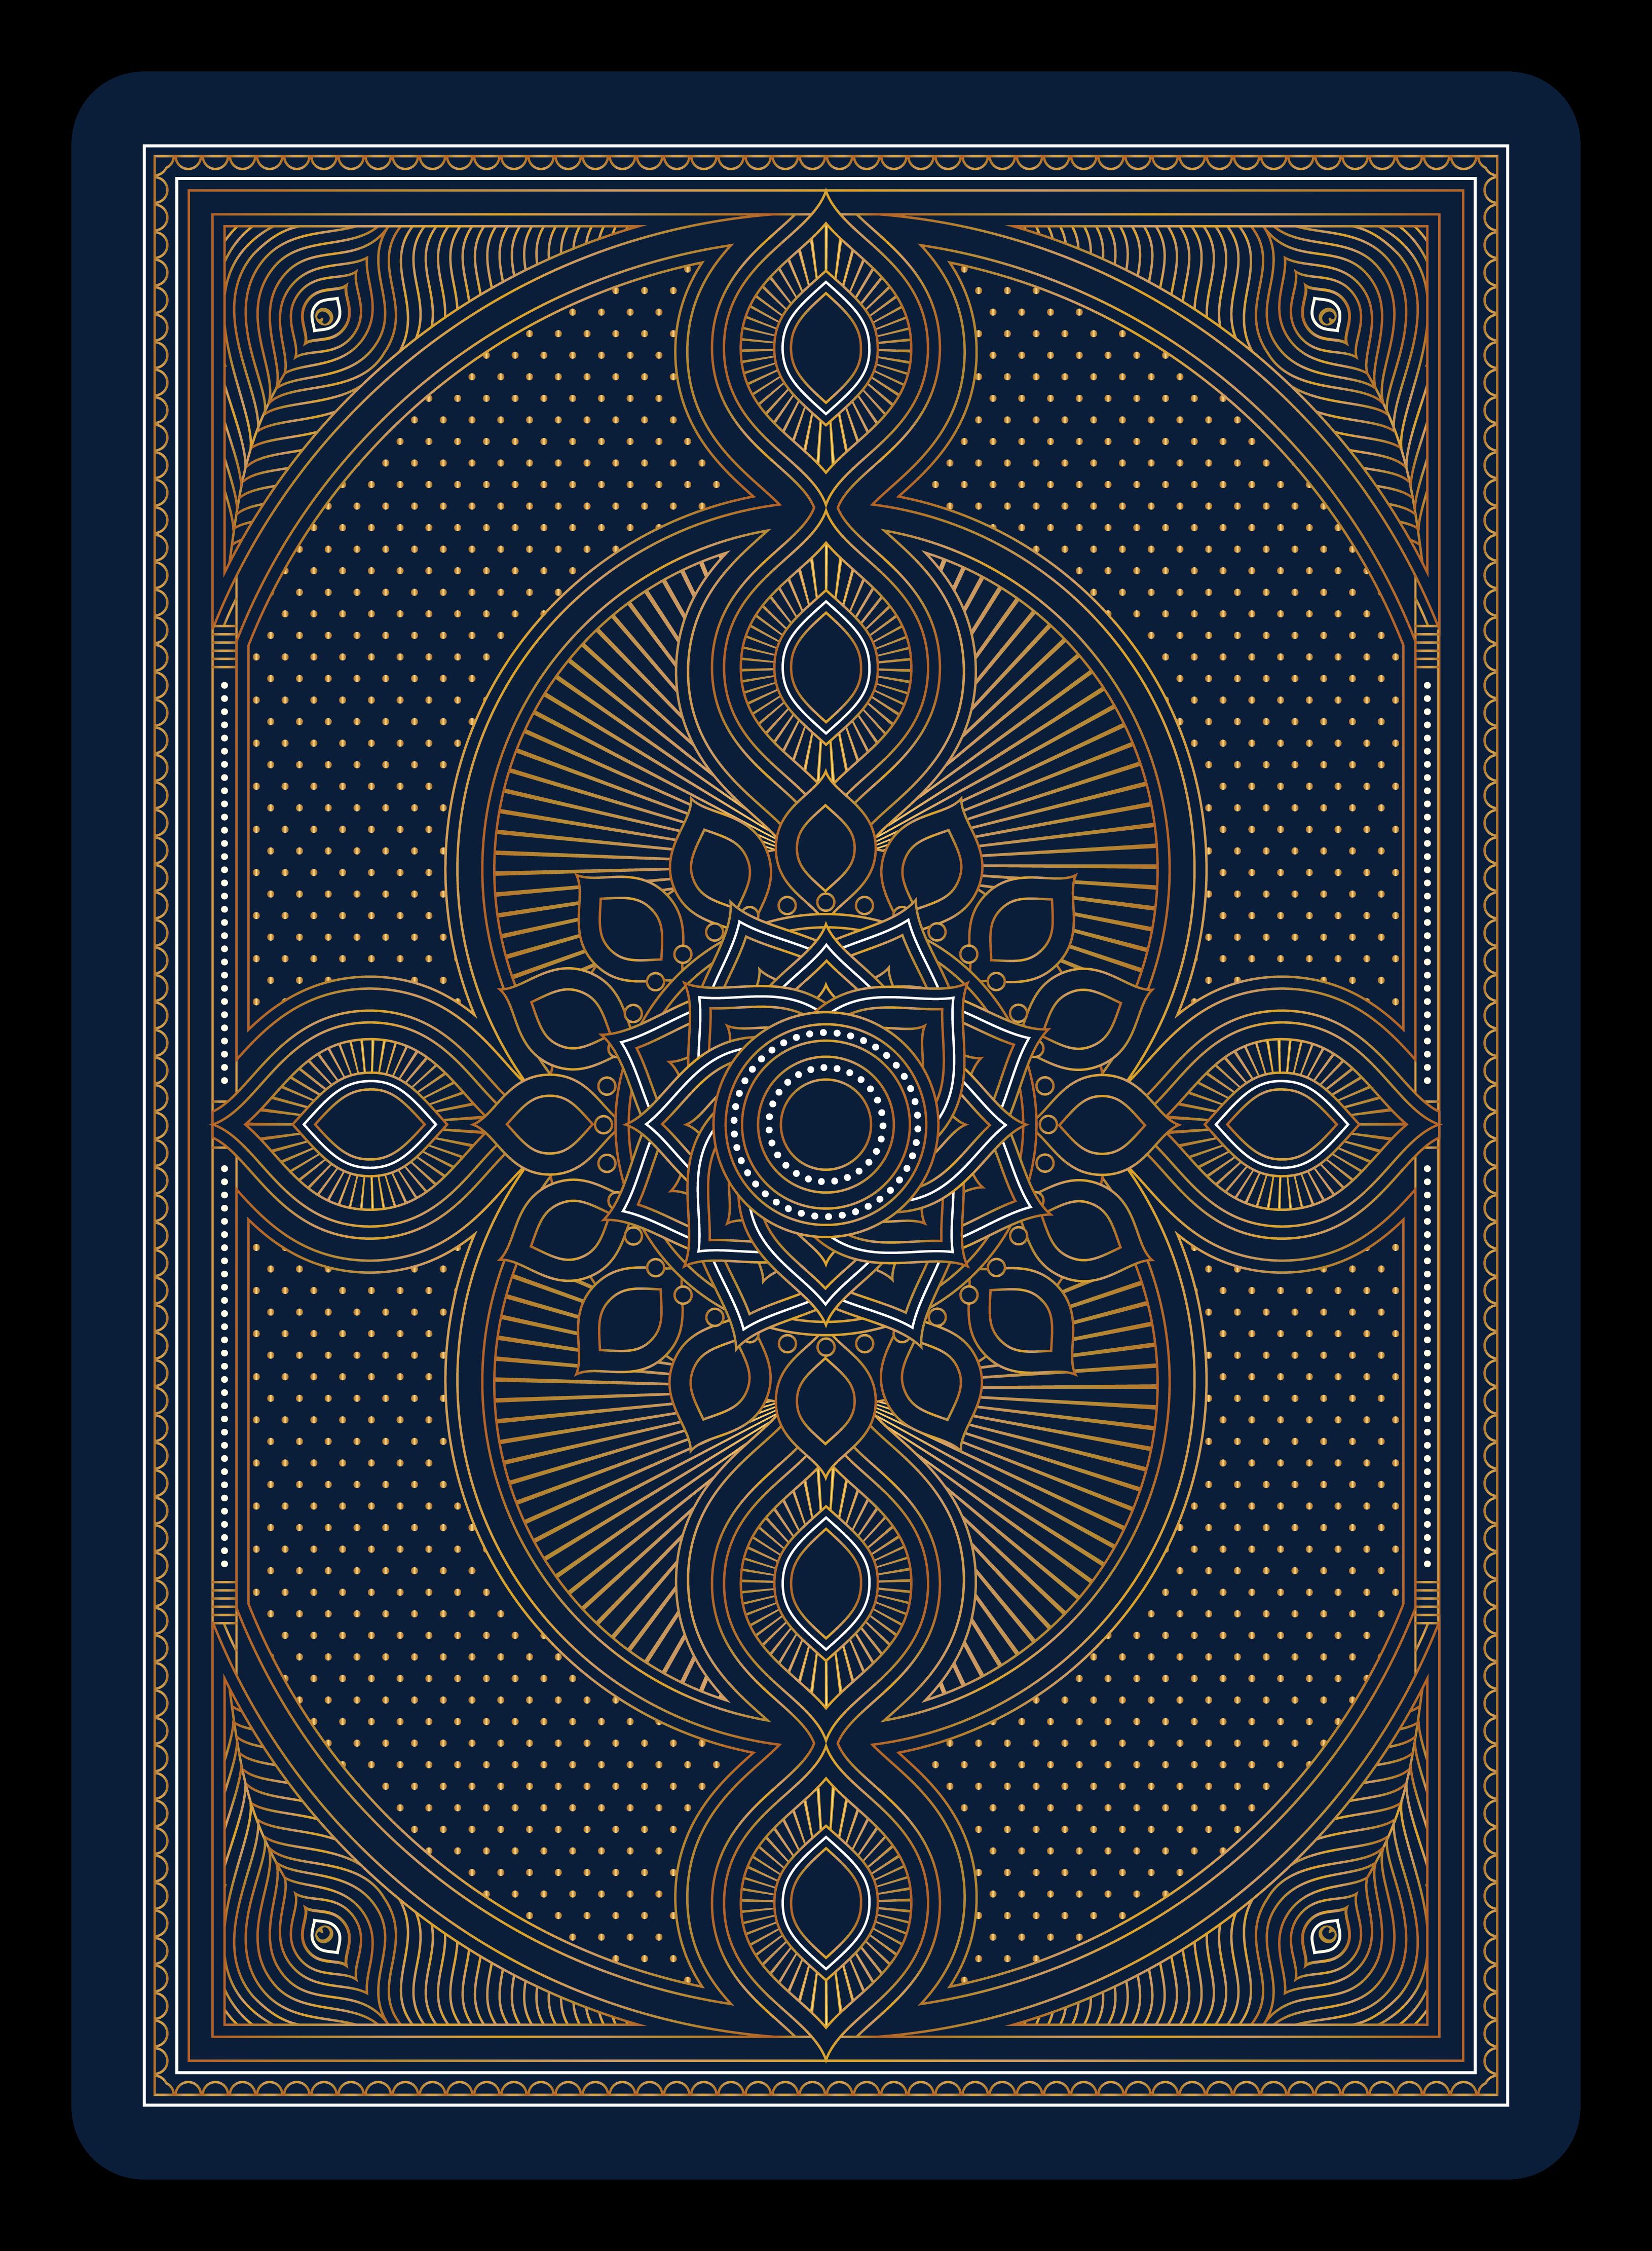 Back Cartamundi200 Imgbb Com Haus Of Cards Cartomancy Card Games